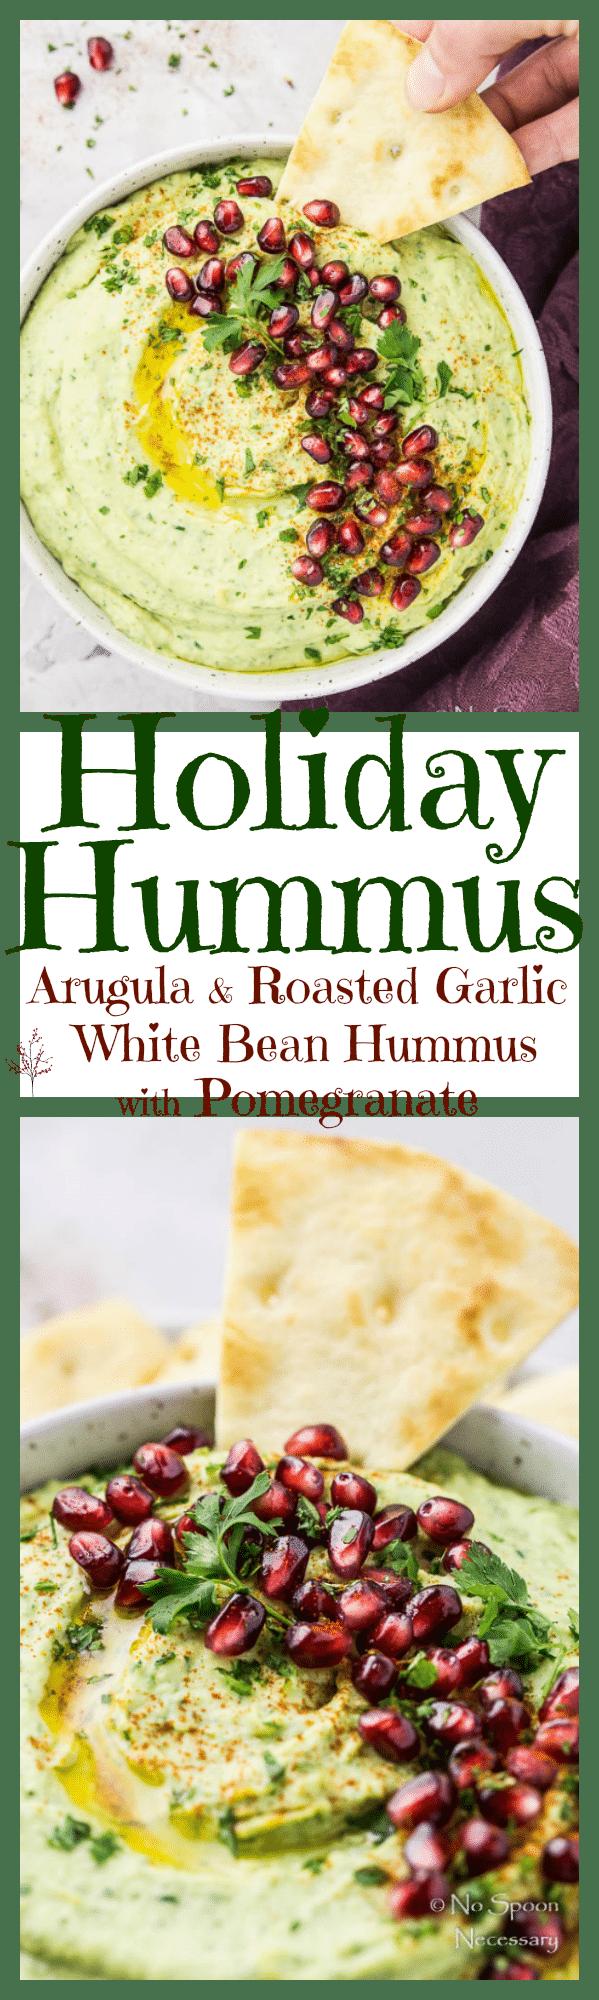 Holiday Hummus {Arugula & Roasted Garlic White Bean Hummus with Pomegranate Arils}